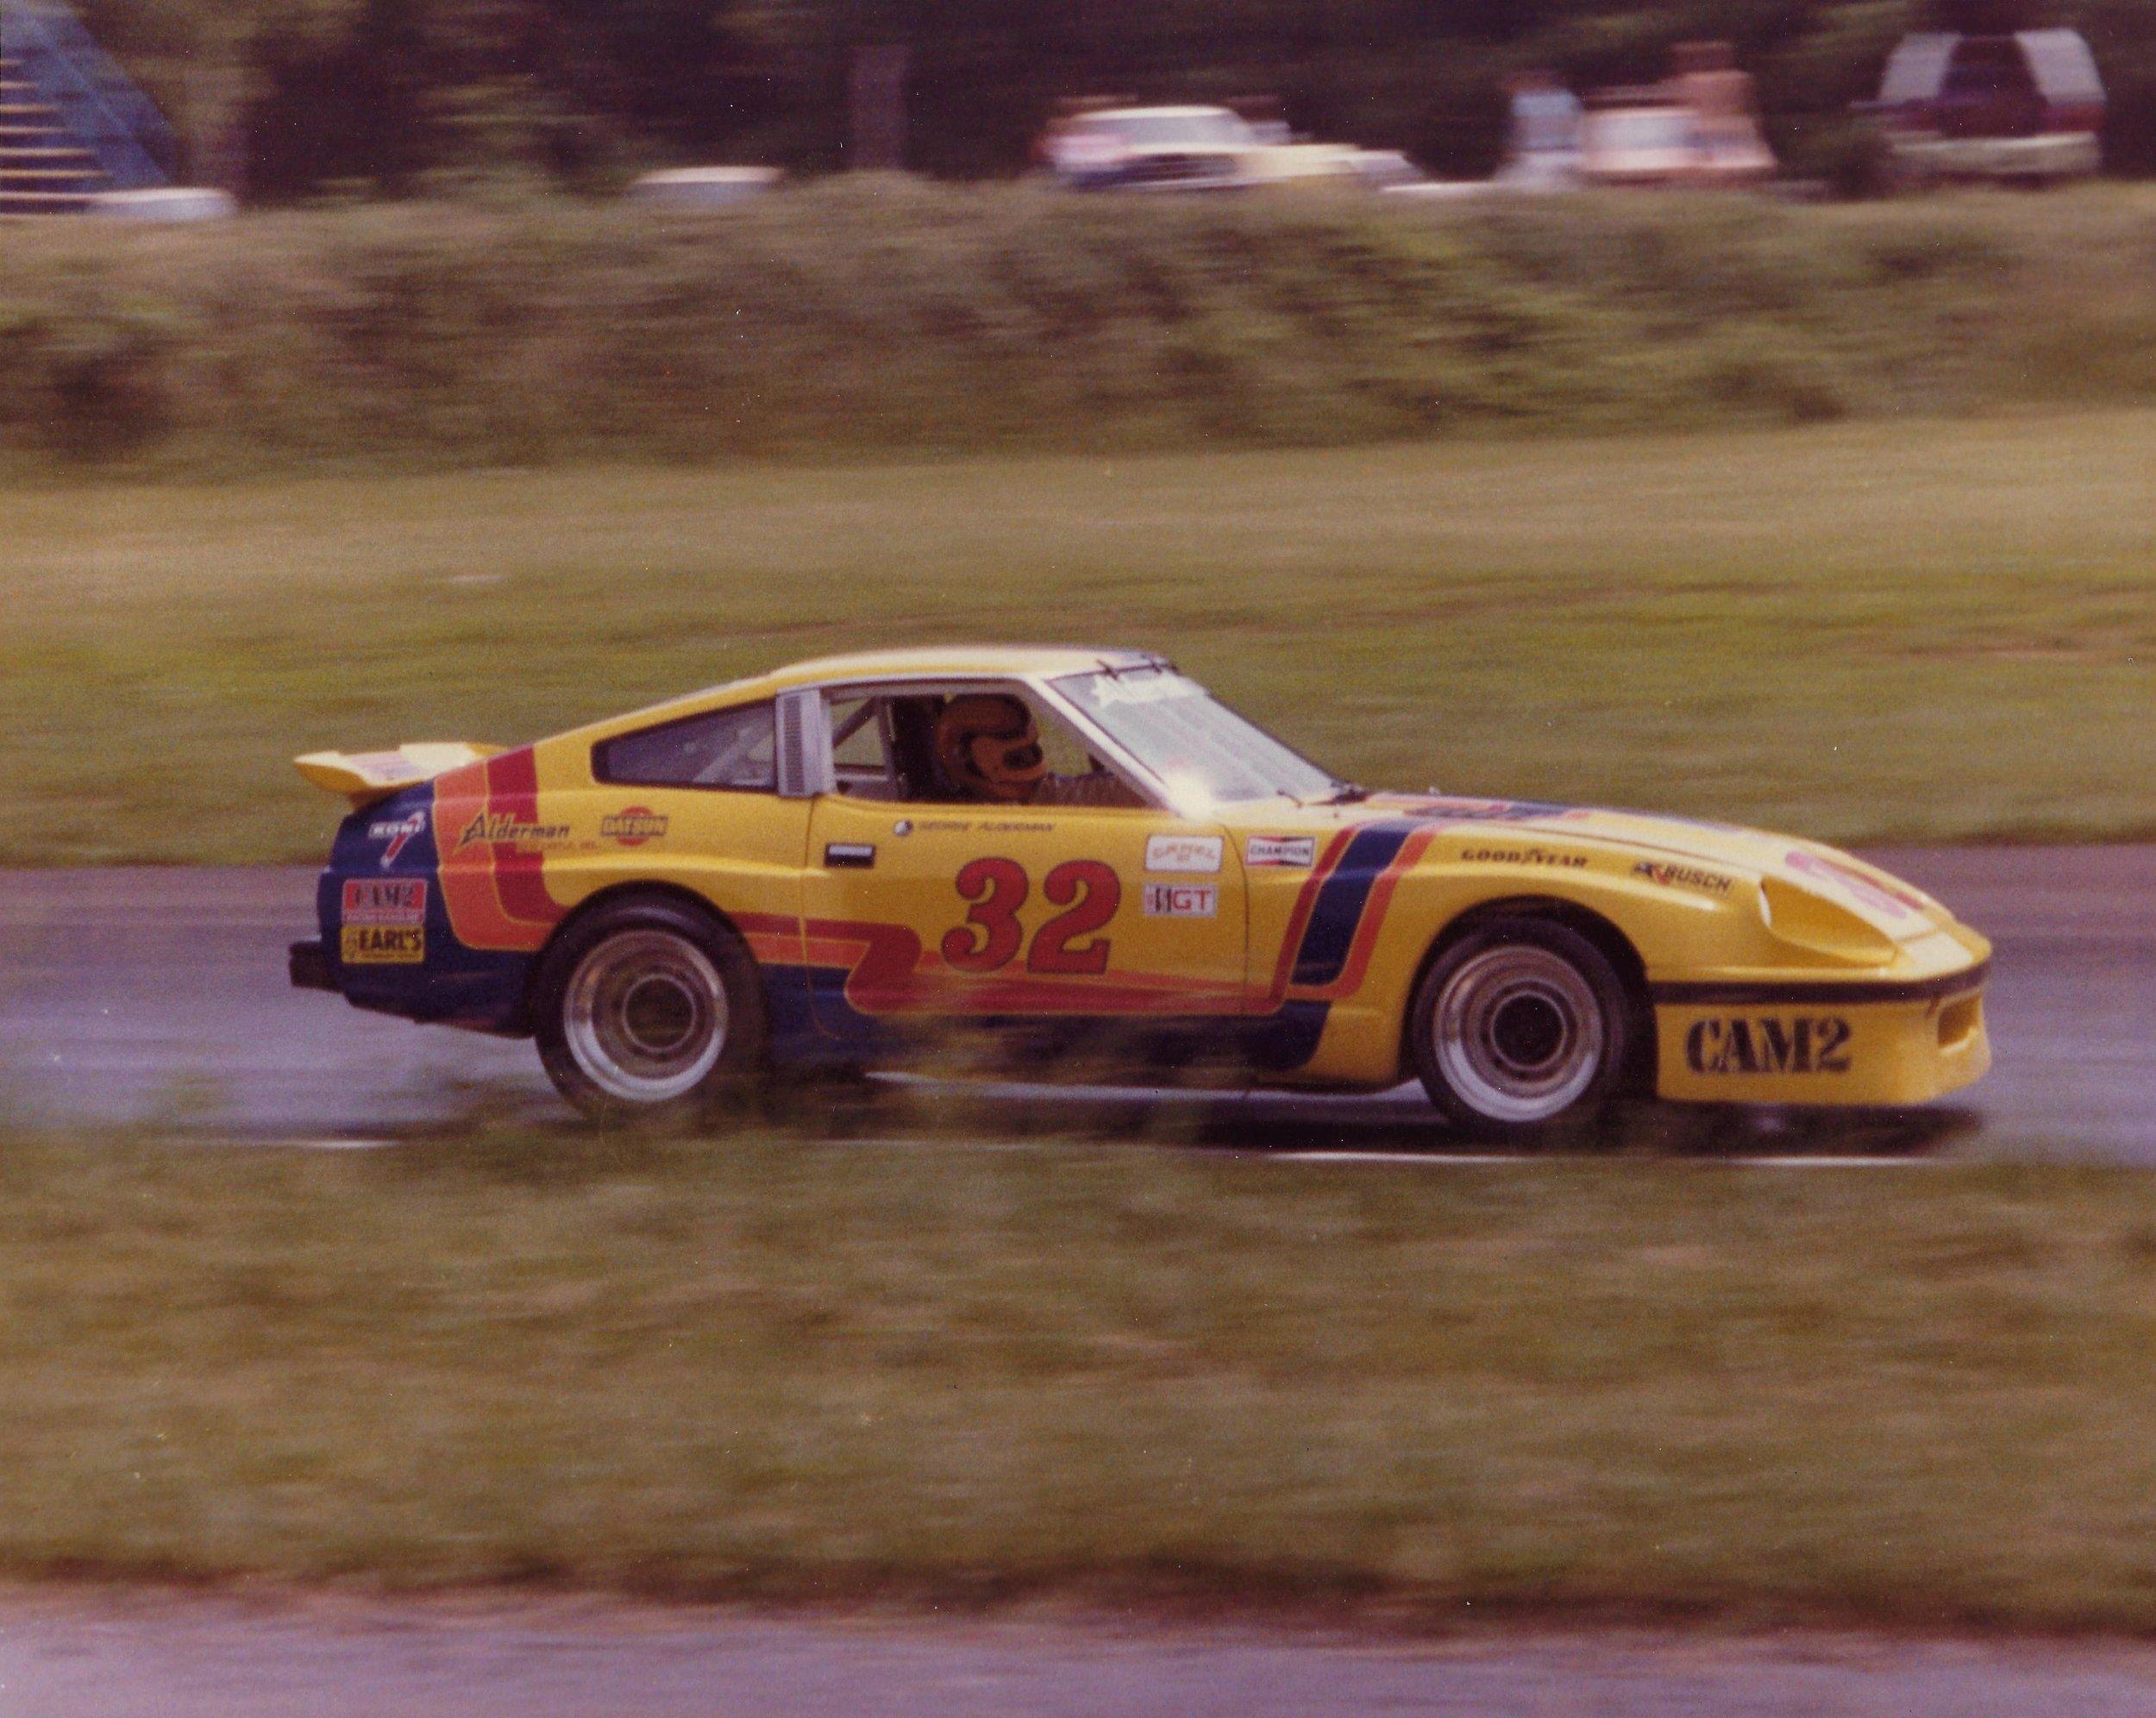 Datsun 280ZX IMSA GTU class (1983)